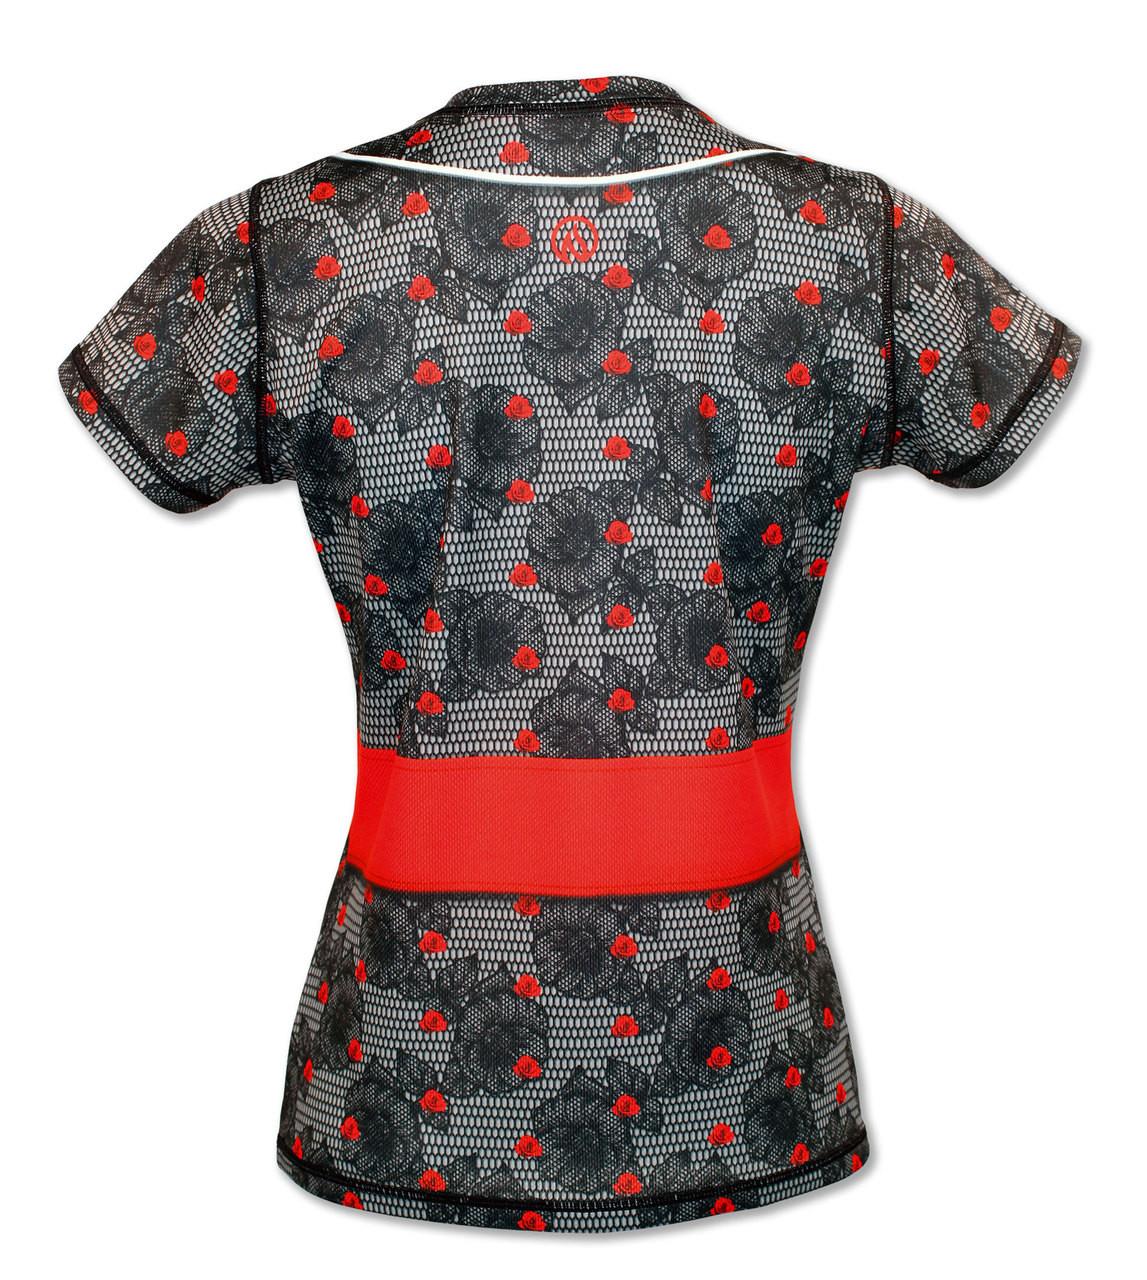 INKnBURN Women's Vintage Tech Shirt Front